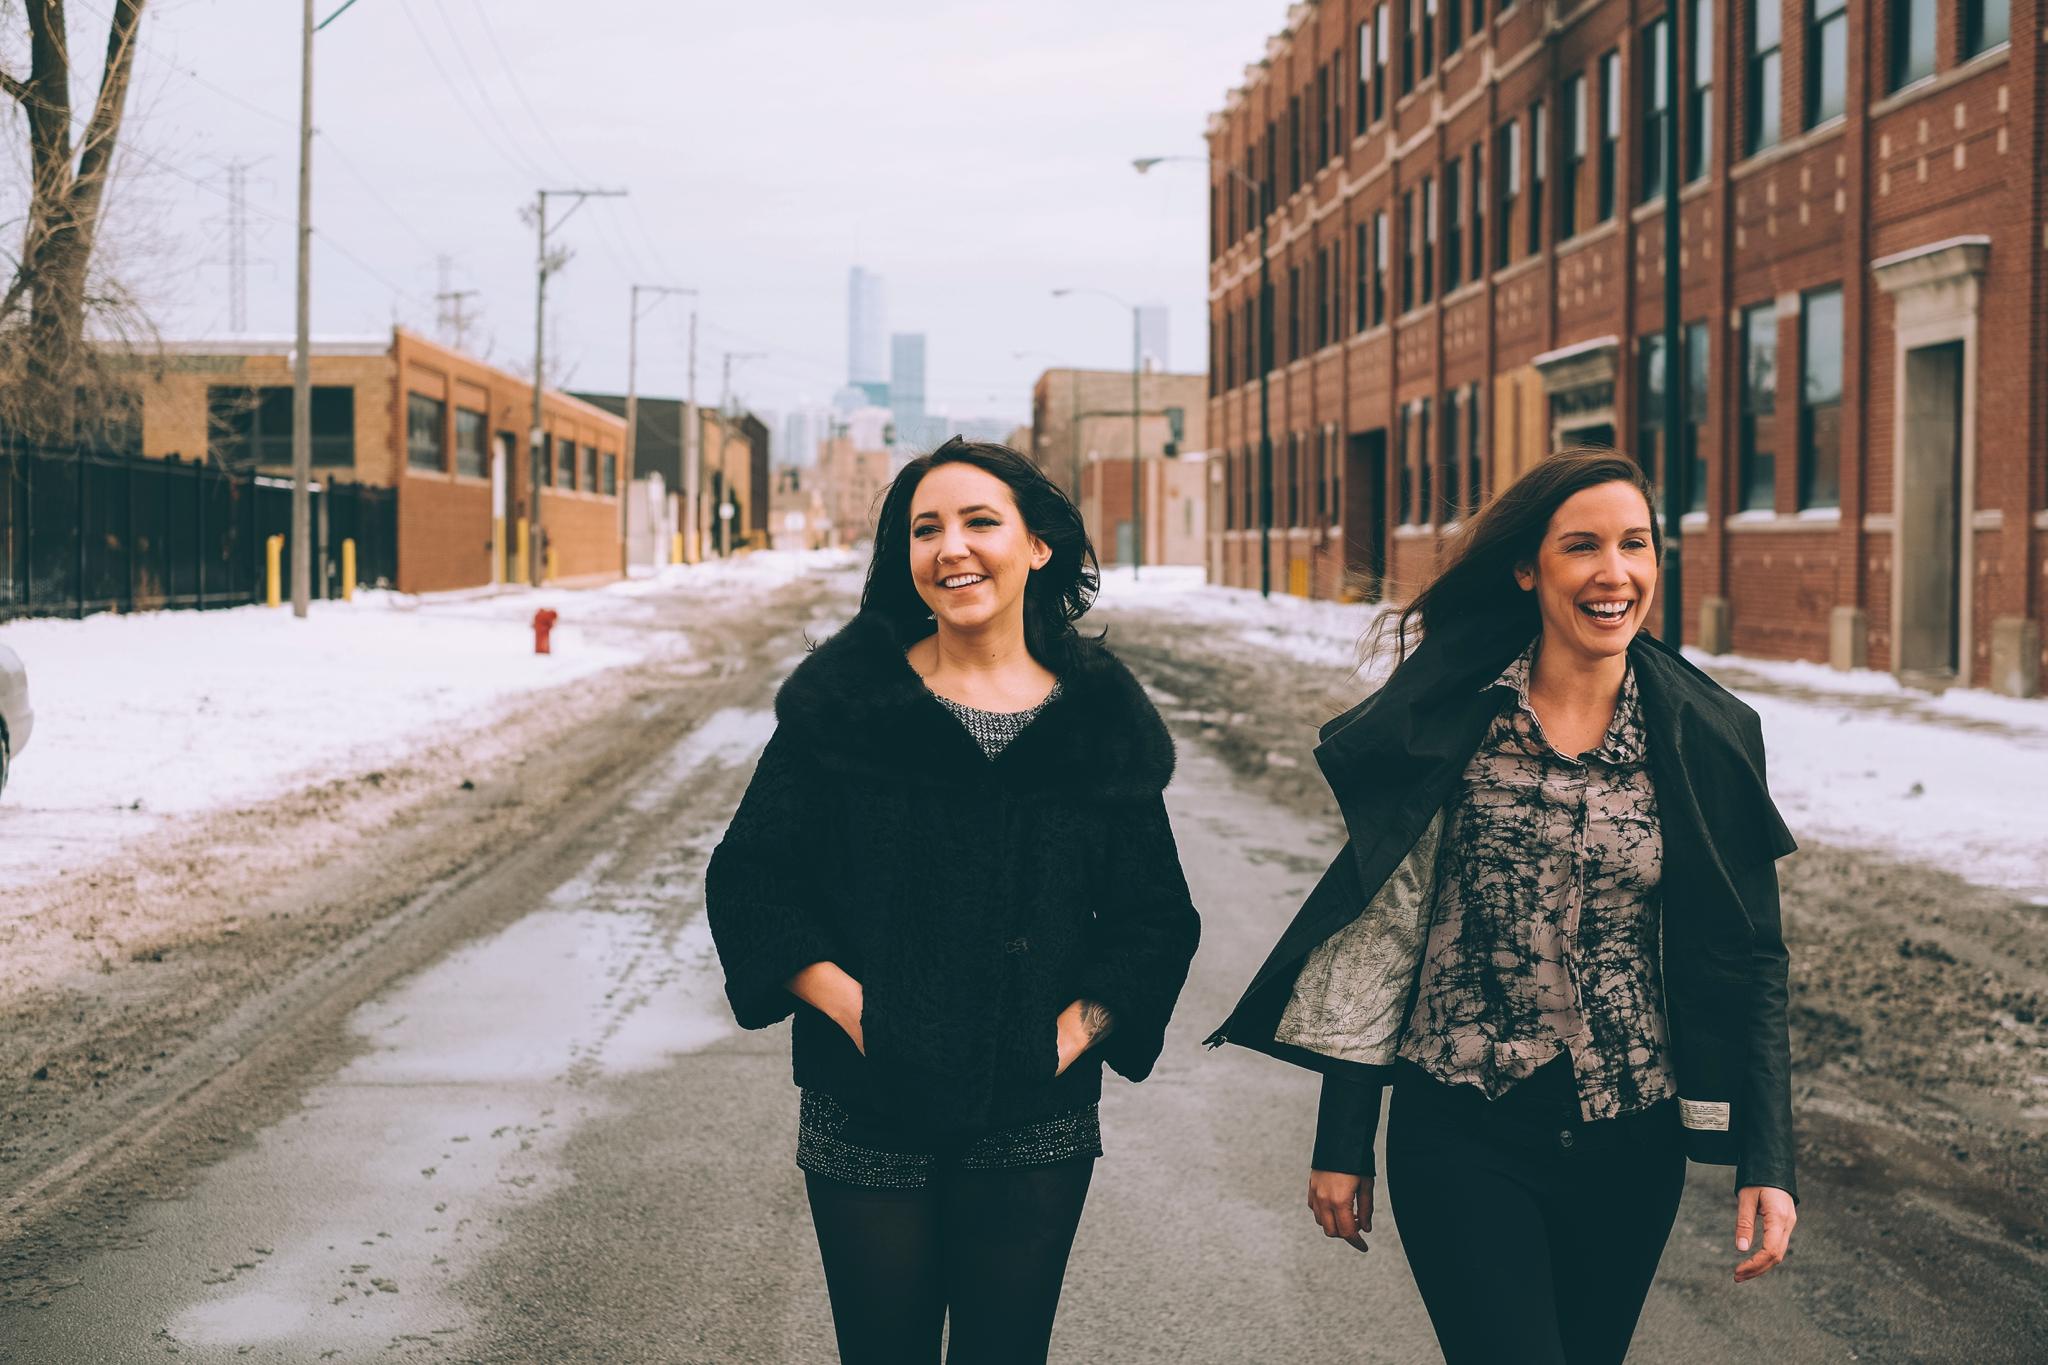 Chicago_Portrait_Photographer-006.jpg